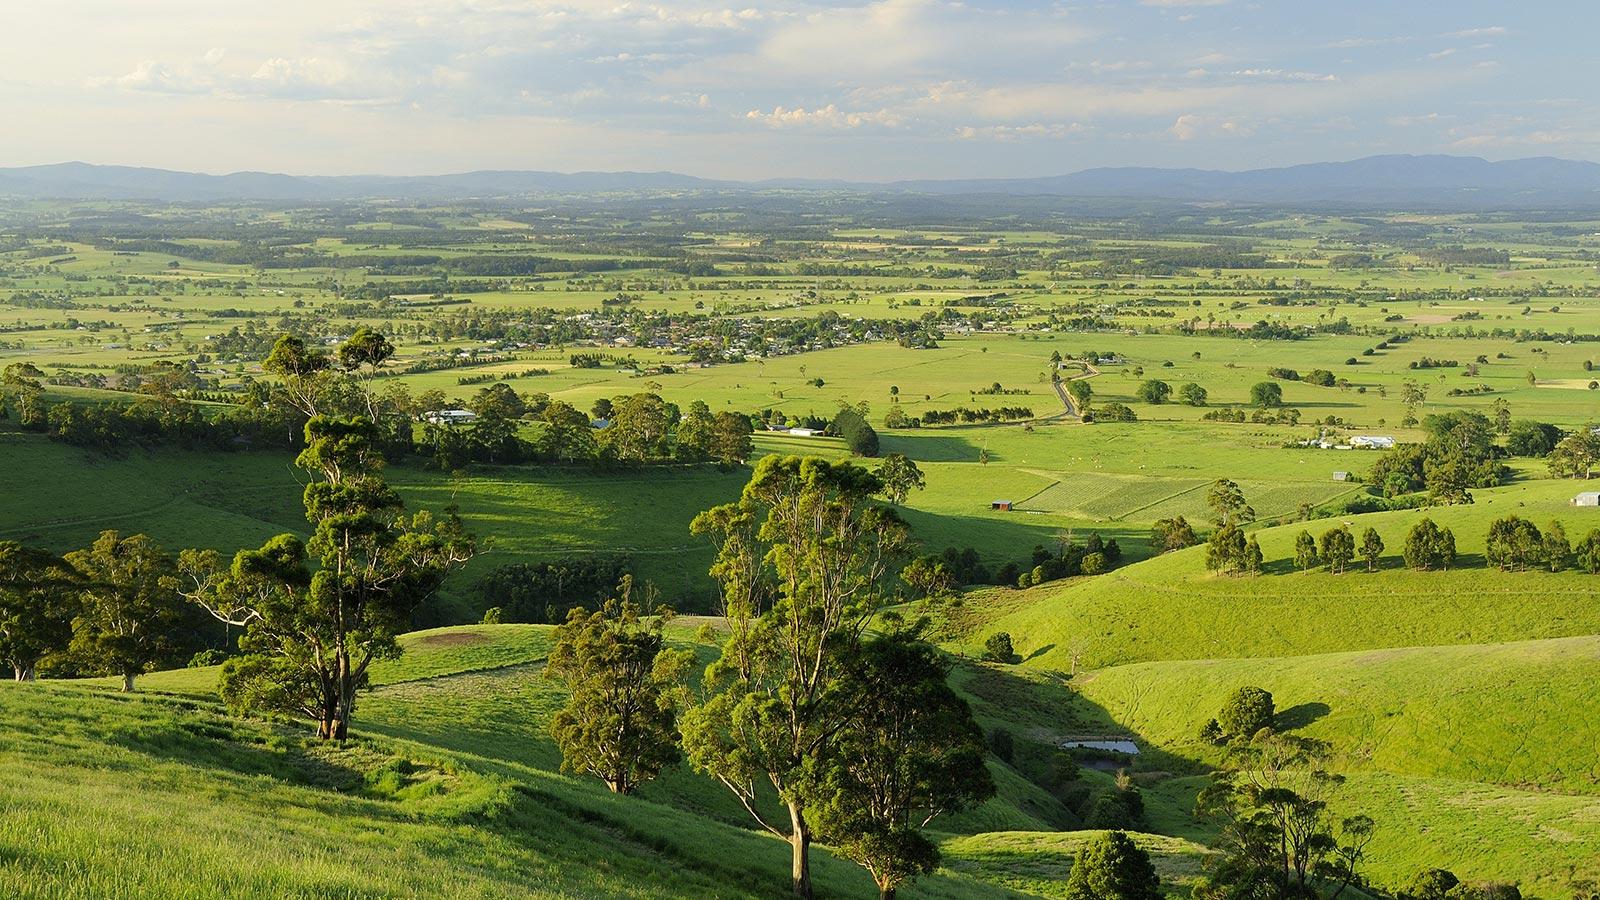 Farmland in Yarragon, Gippsland, Victoria, Australia